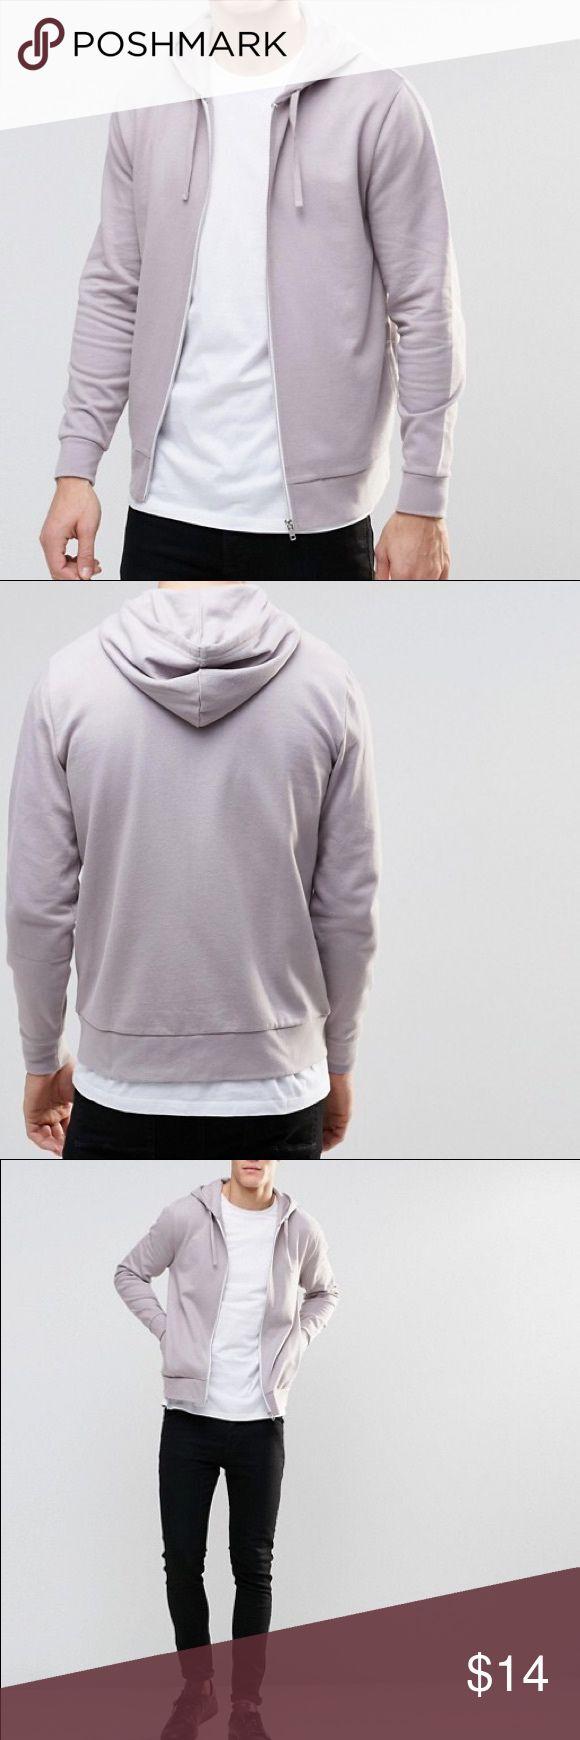 Asos men's light purple hoodie Good condition. Soft but a bit worn. Make an offer~ ASOS Shirts Sweatshirts & Hoodies